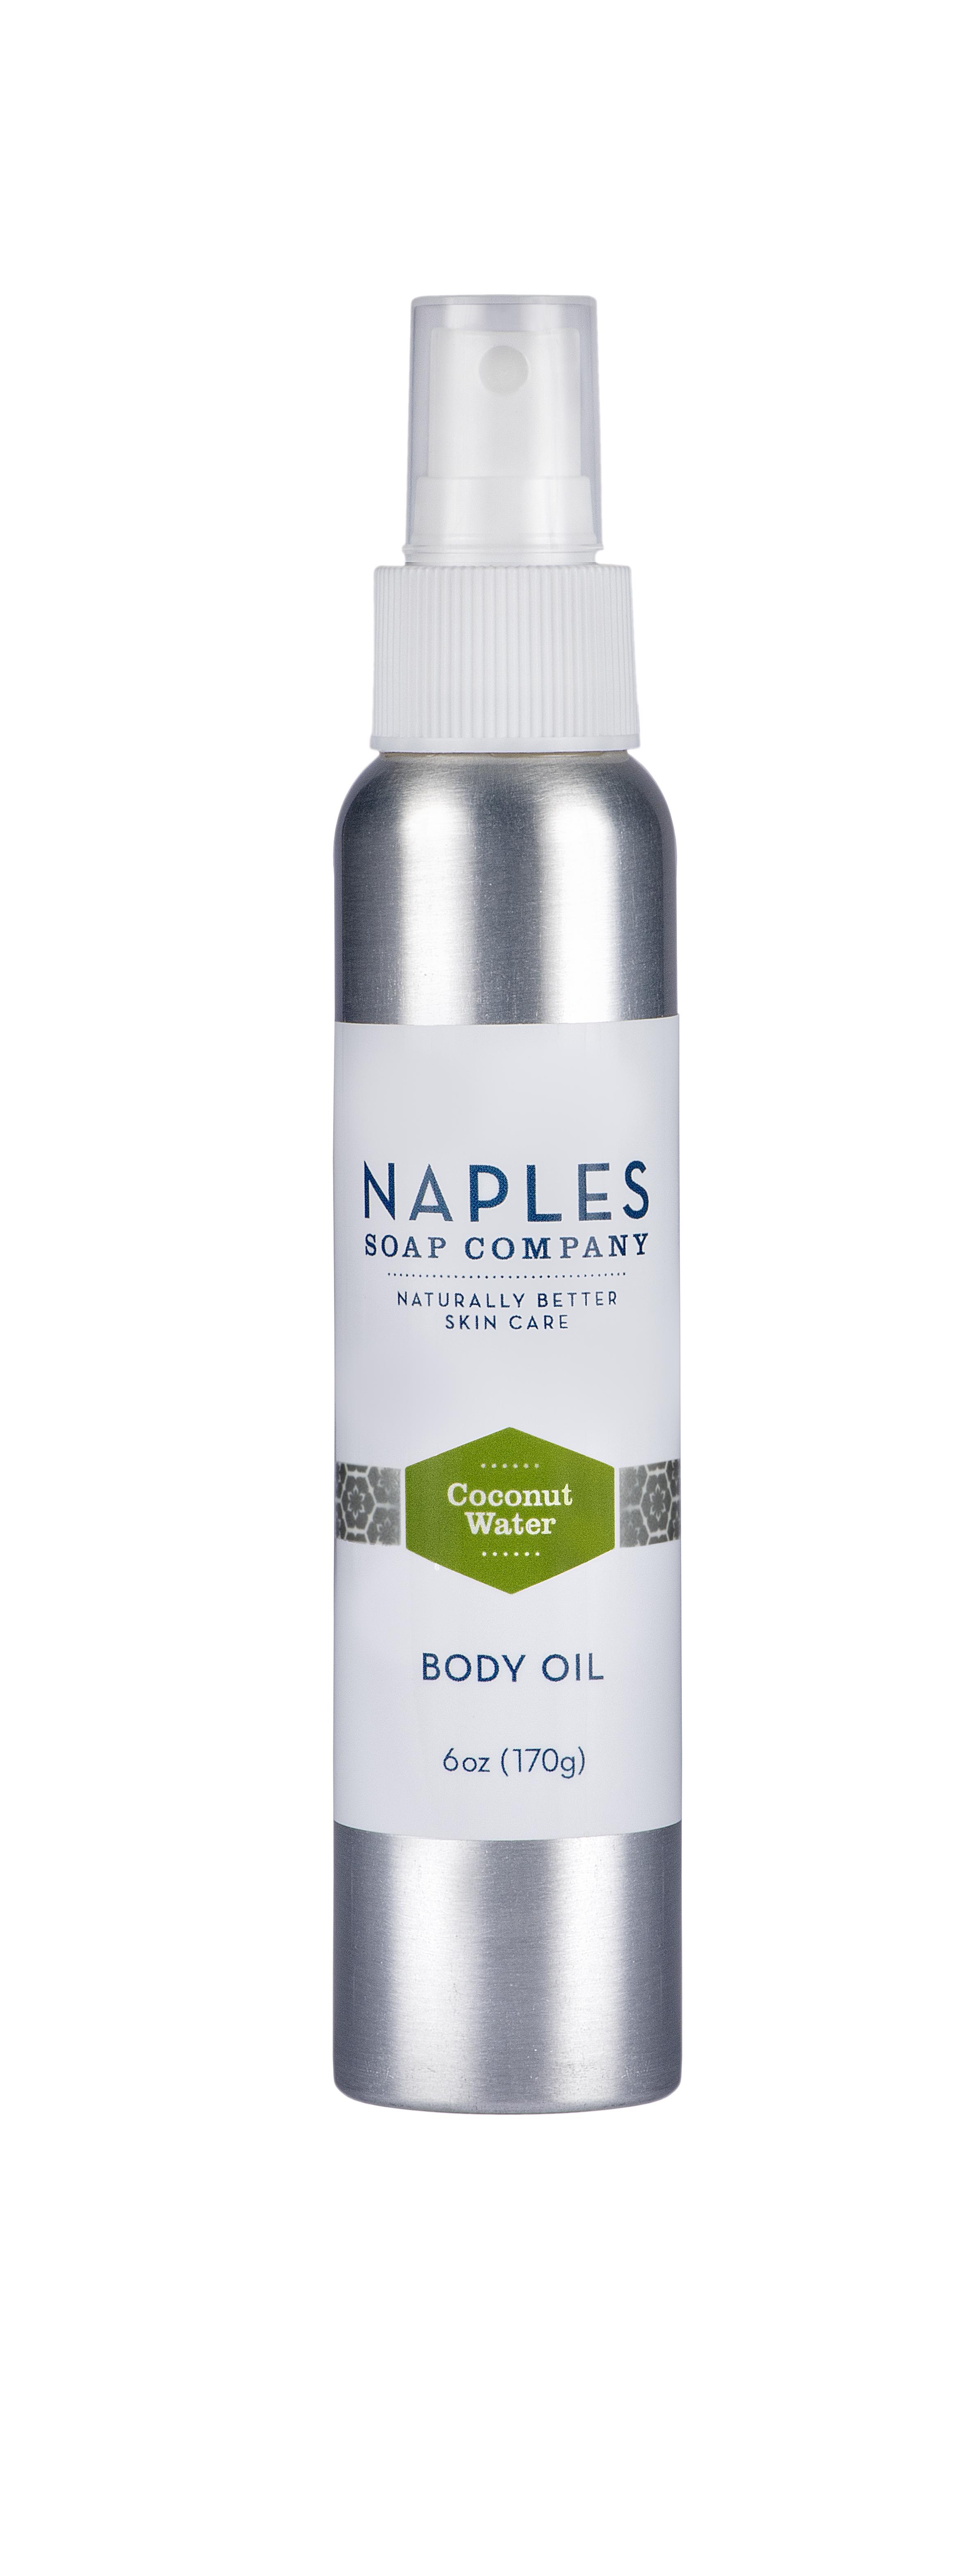 Coconut Water Body Oil